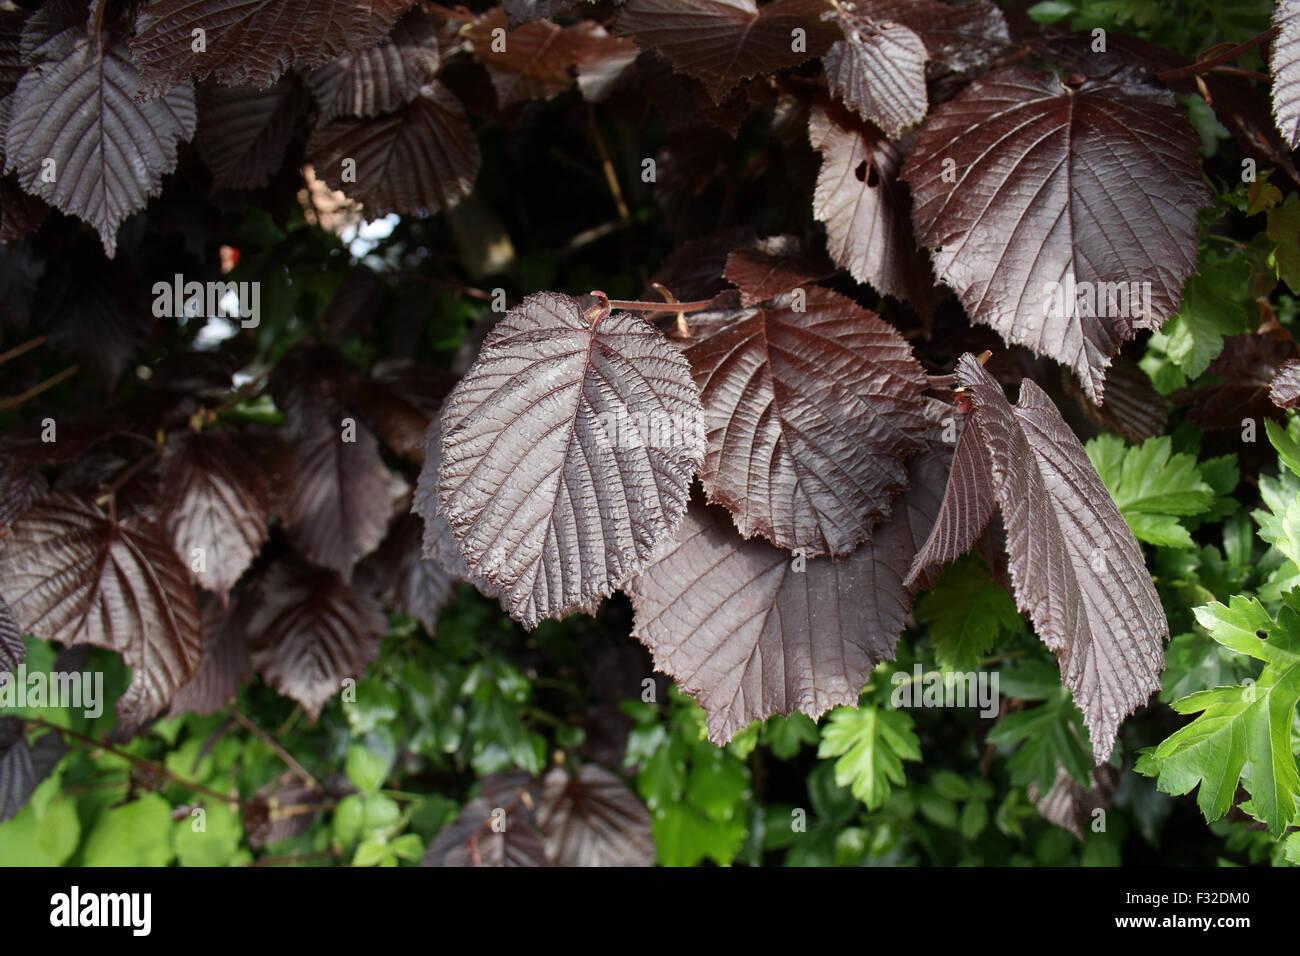 Filbert (Corylus maxima) 'Purpurea', close-up of leaves, growing in garden hedge, Mendlesham, Suffolk, England, - Stock Image